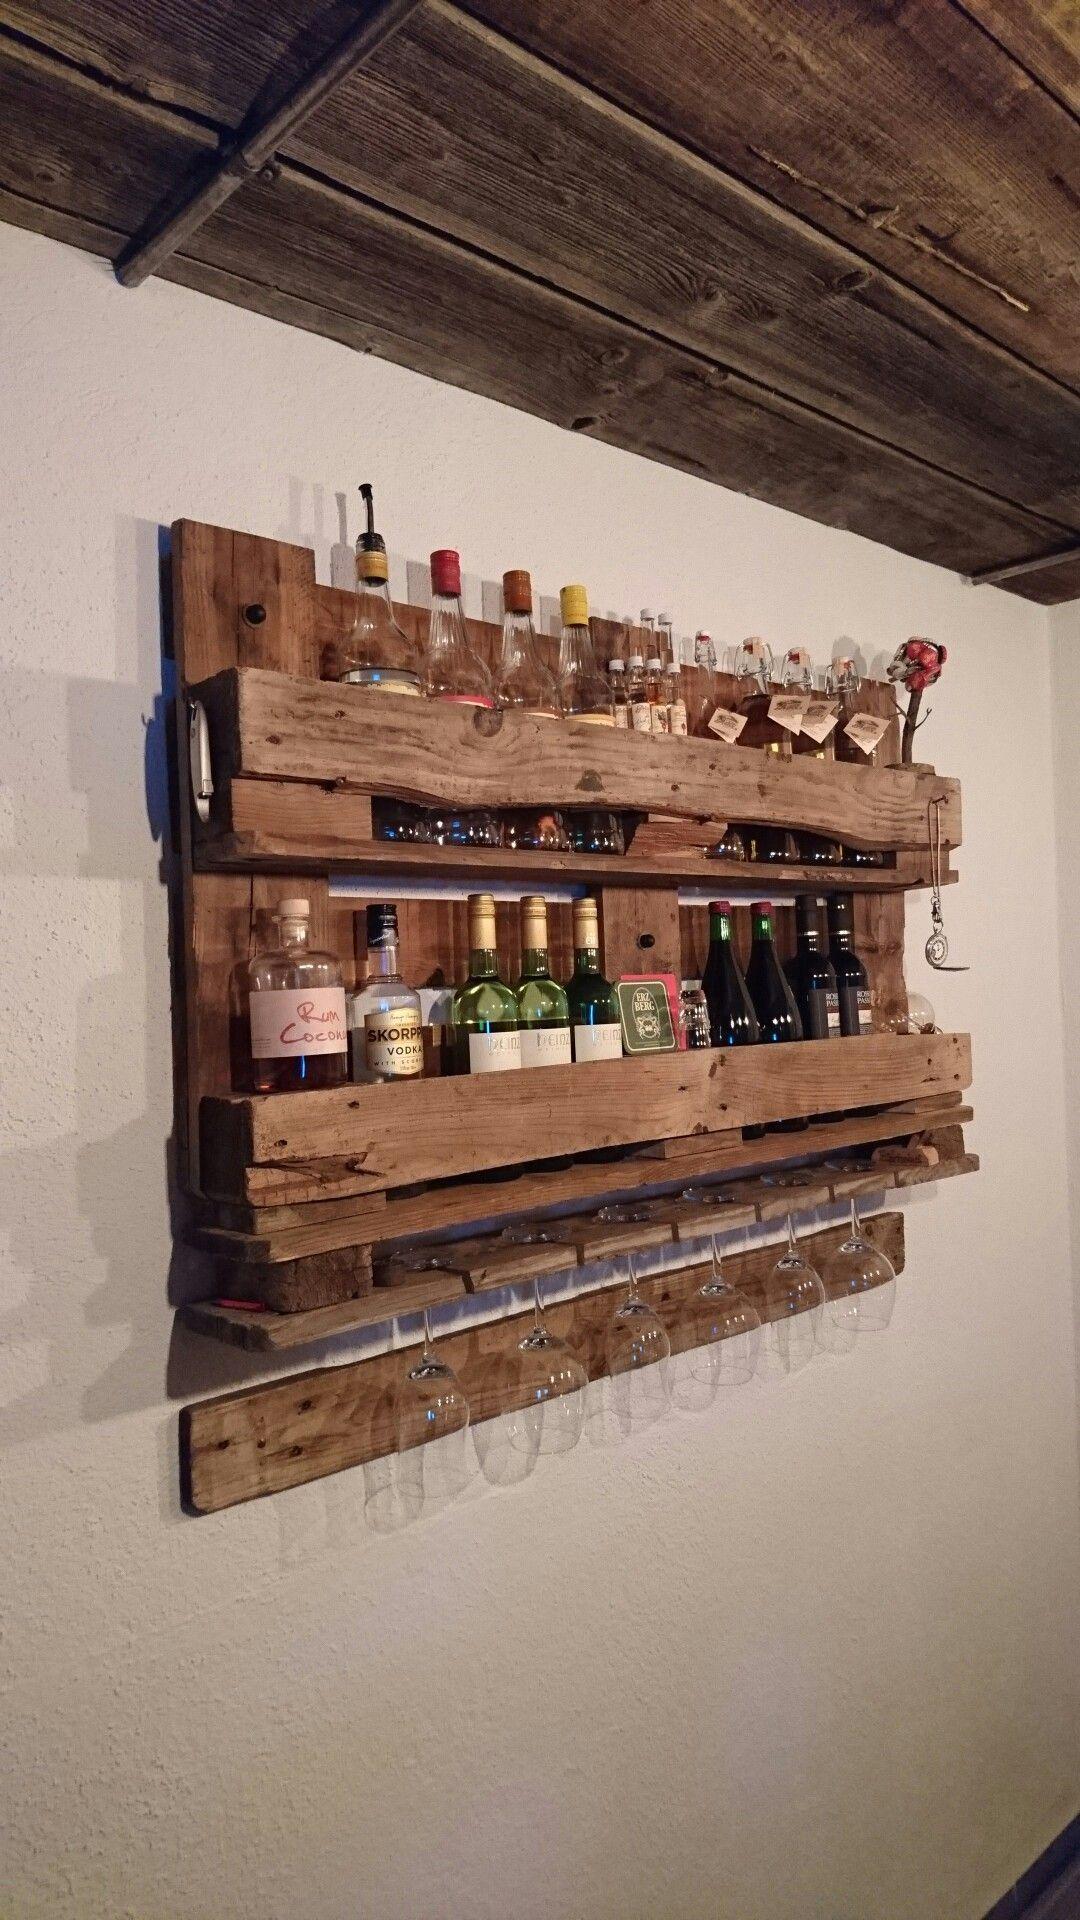 WEINREGAL EURO PALETTEN MÖBEL Wandregal Holz Bar Rustikal